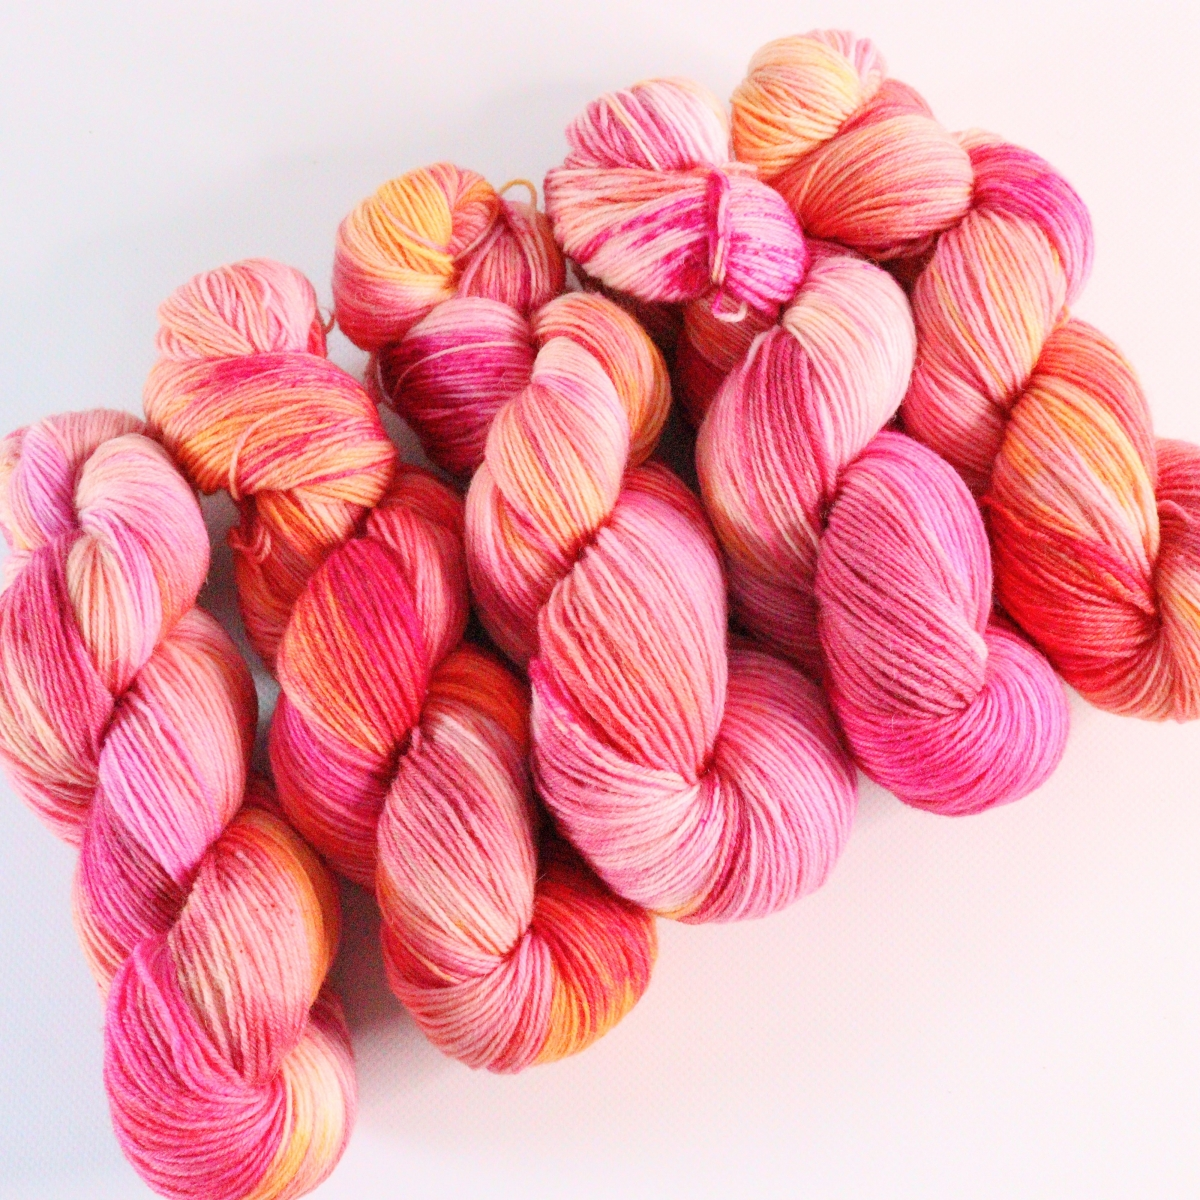 woodico.pro hand dyed yarn 076 1 1200x1200 - Hand dyed yarn / 076